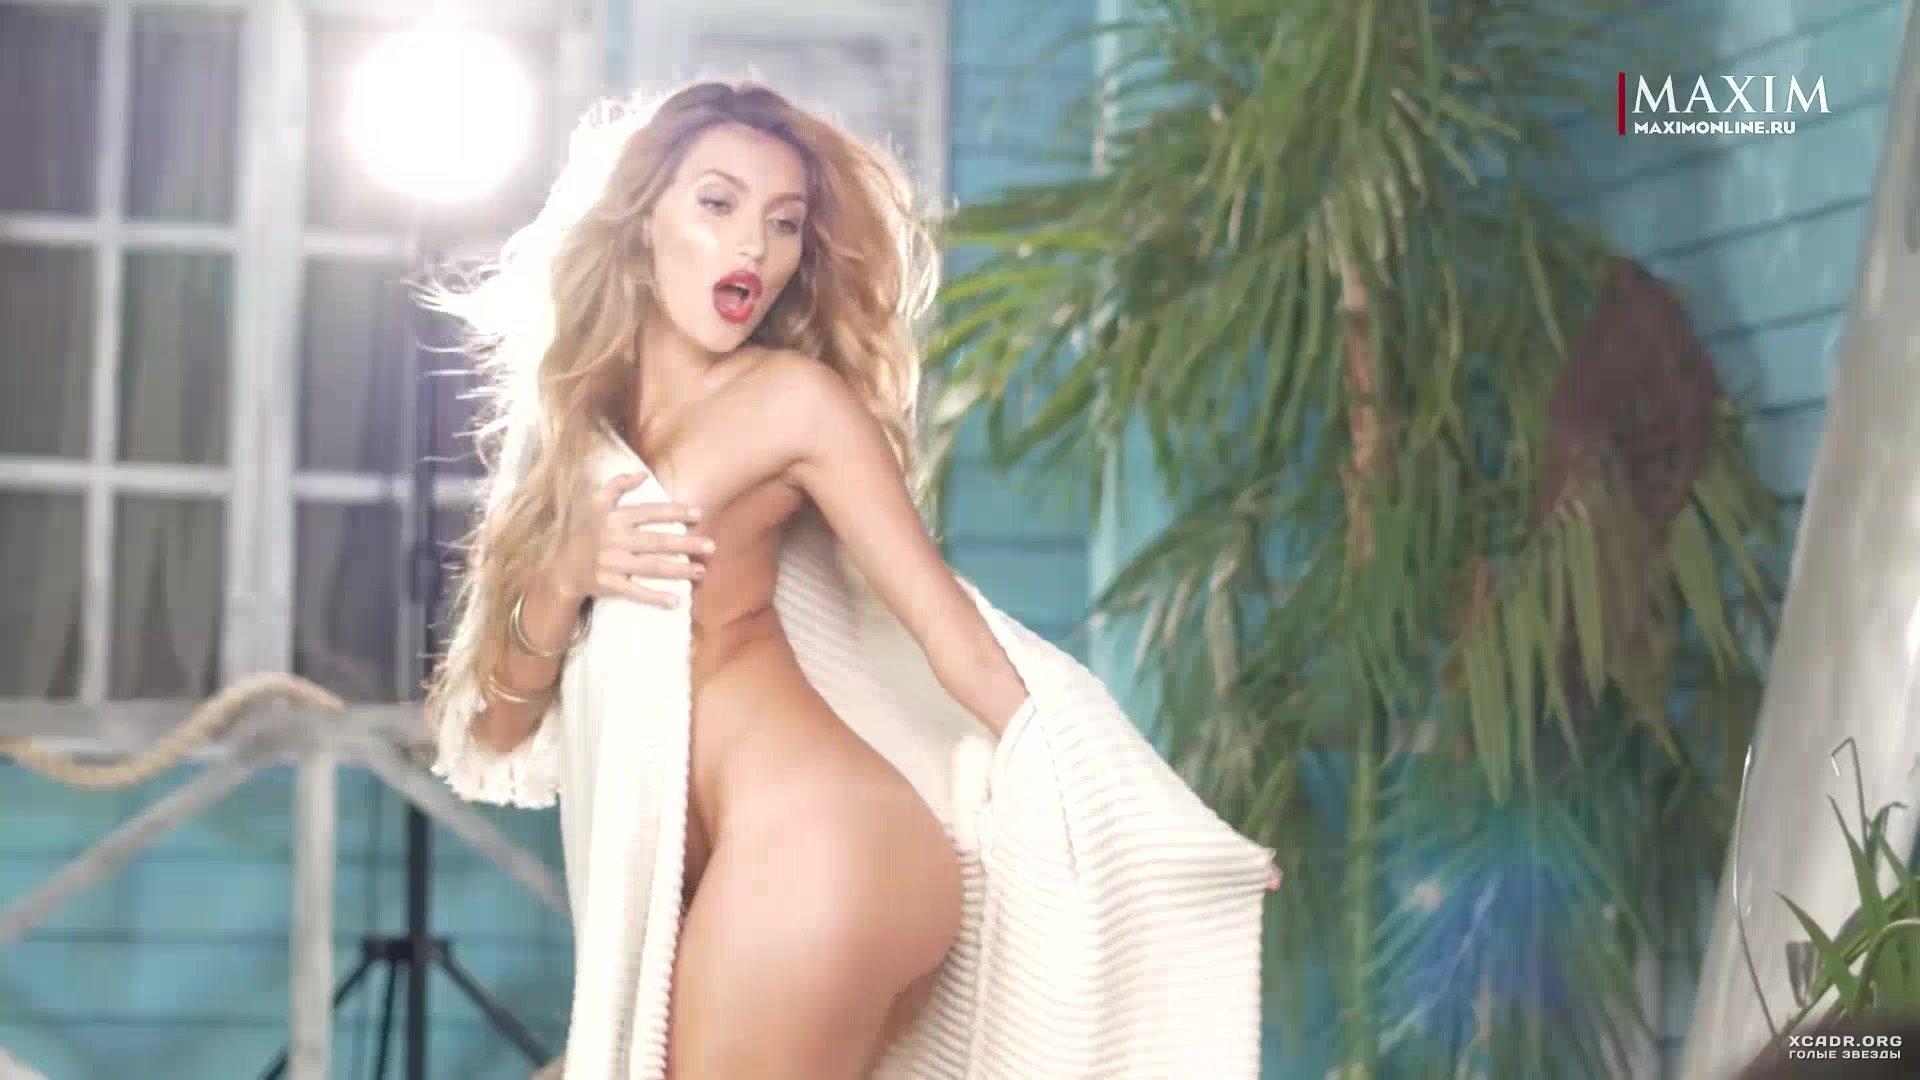 Регина Тодоренко порно видео домашнее, голая фото